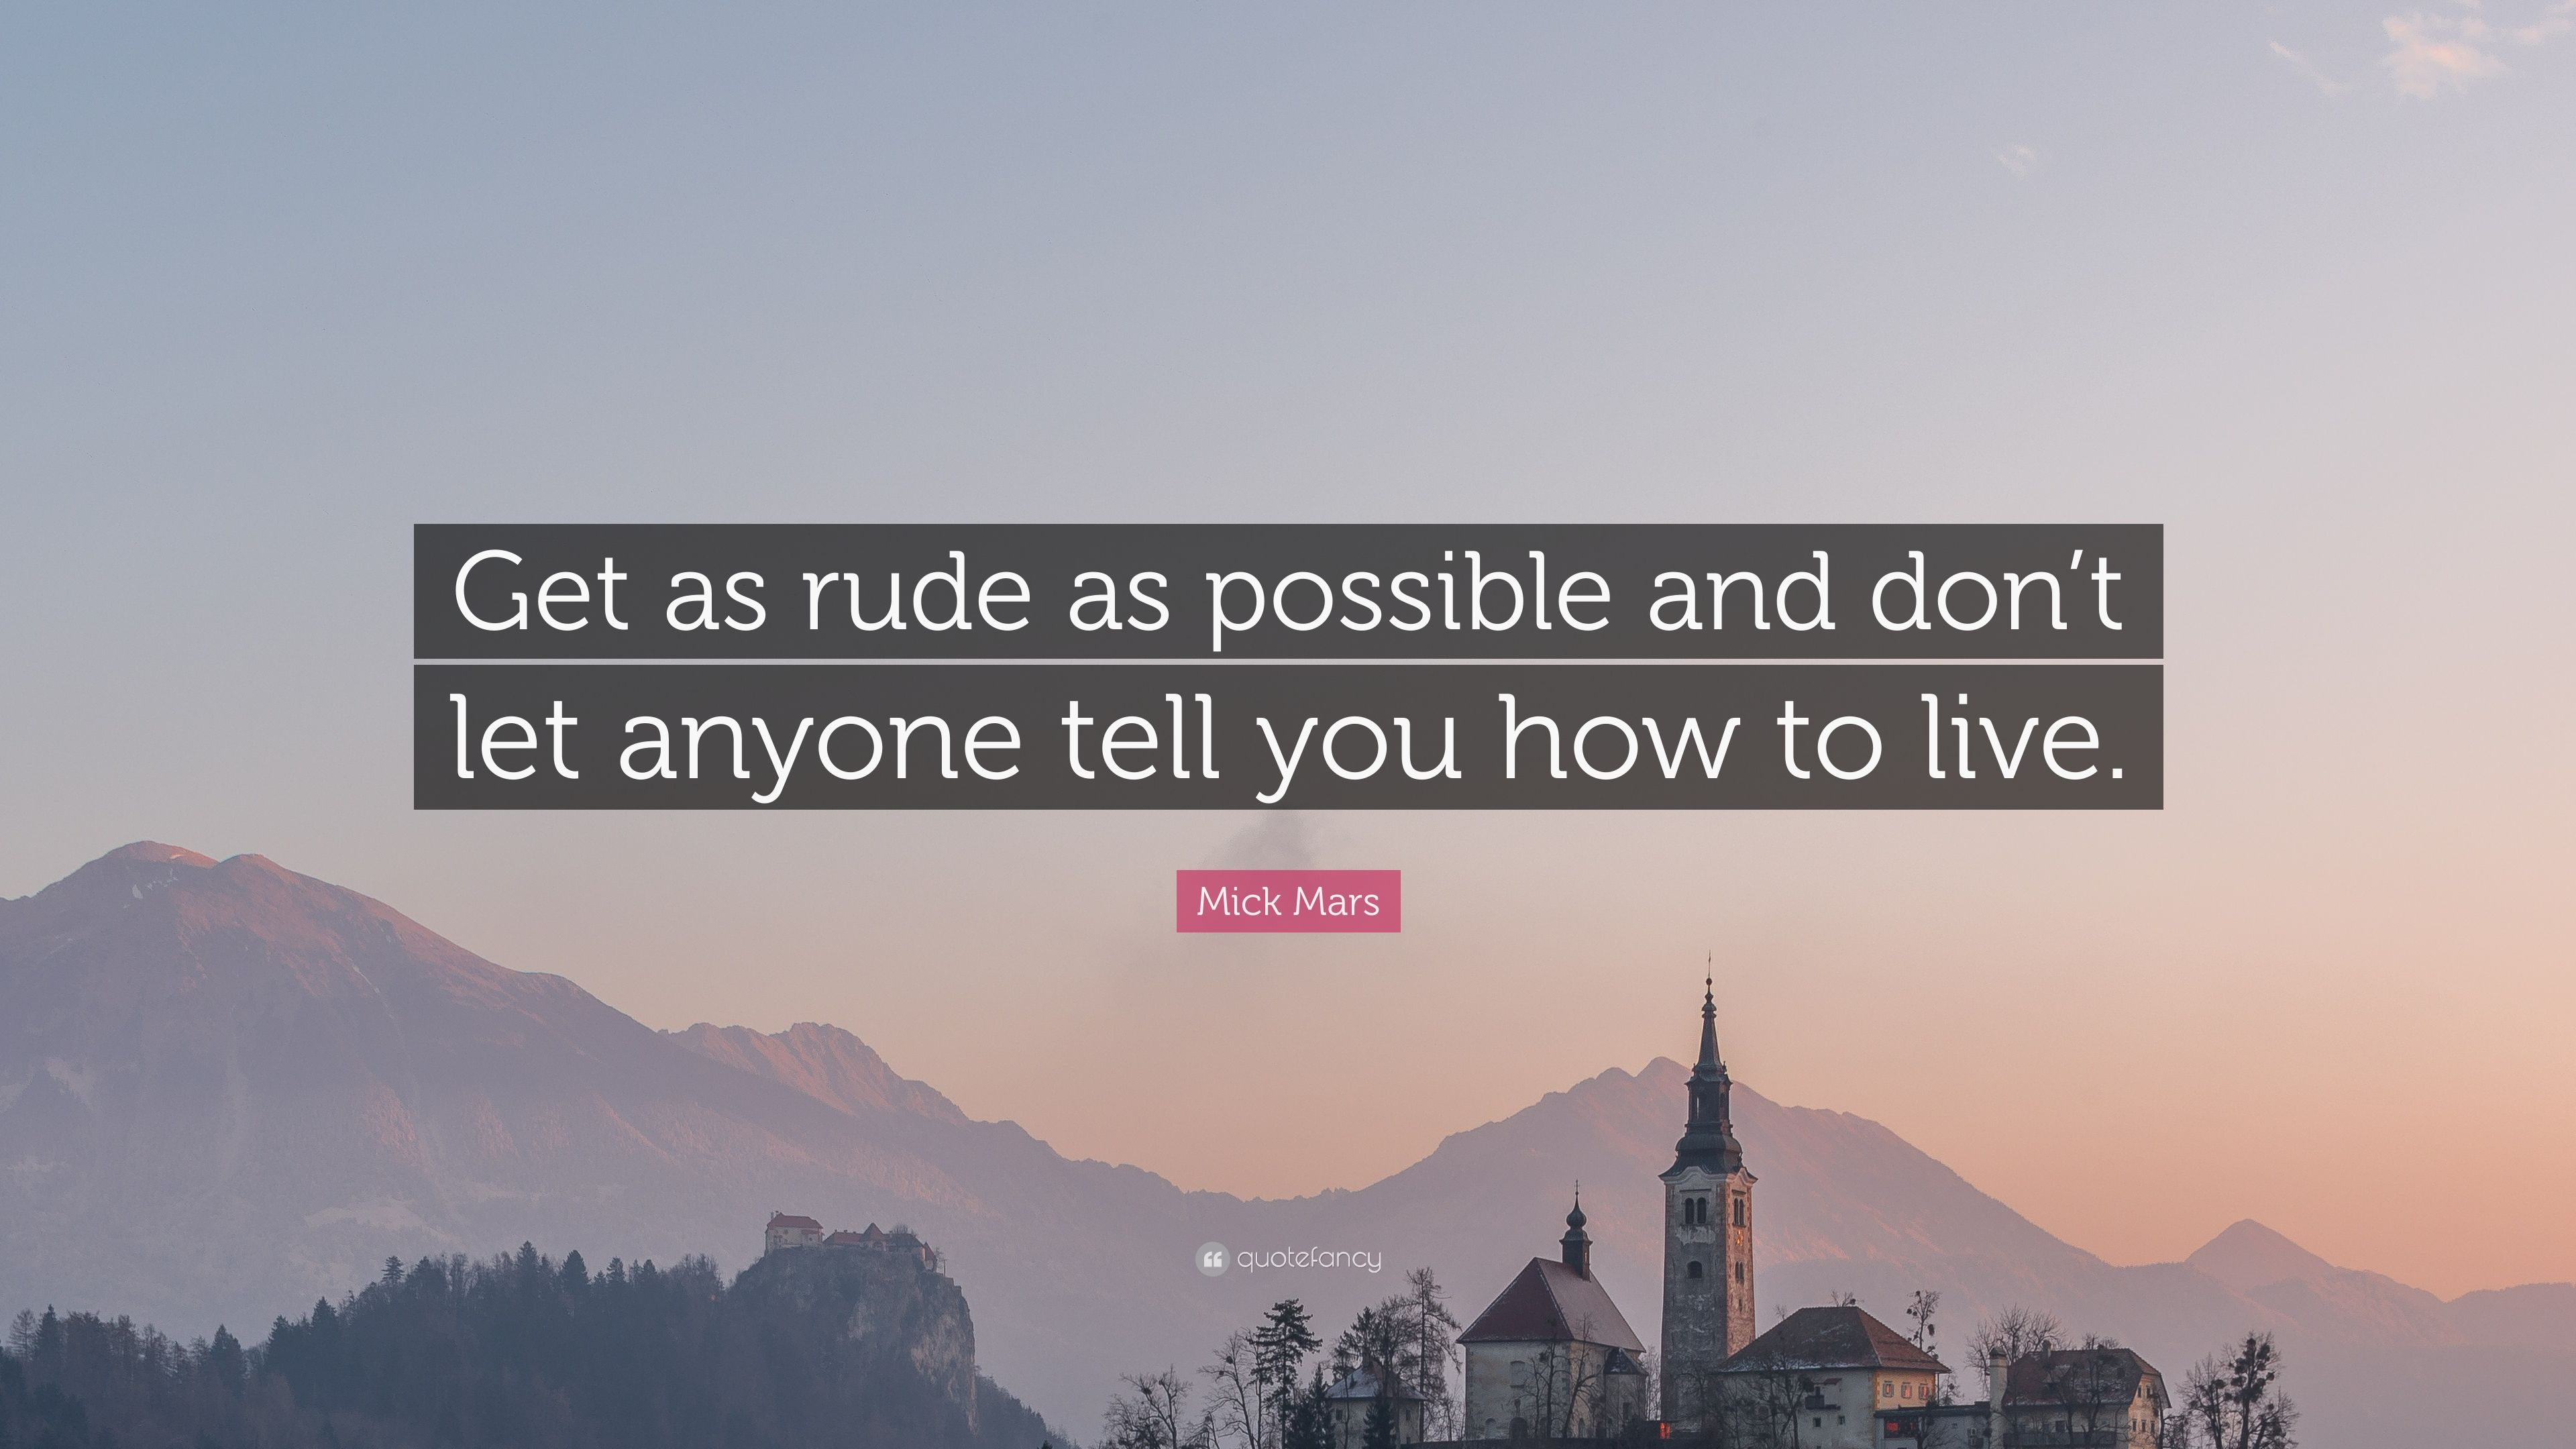 as rude as